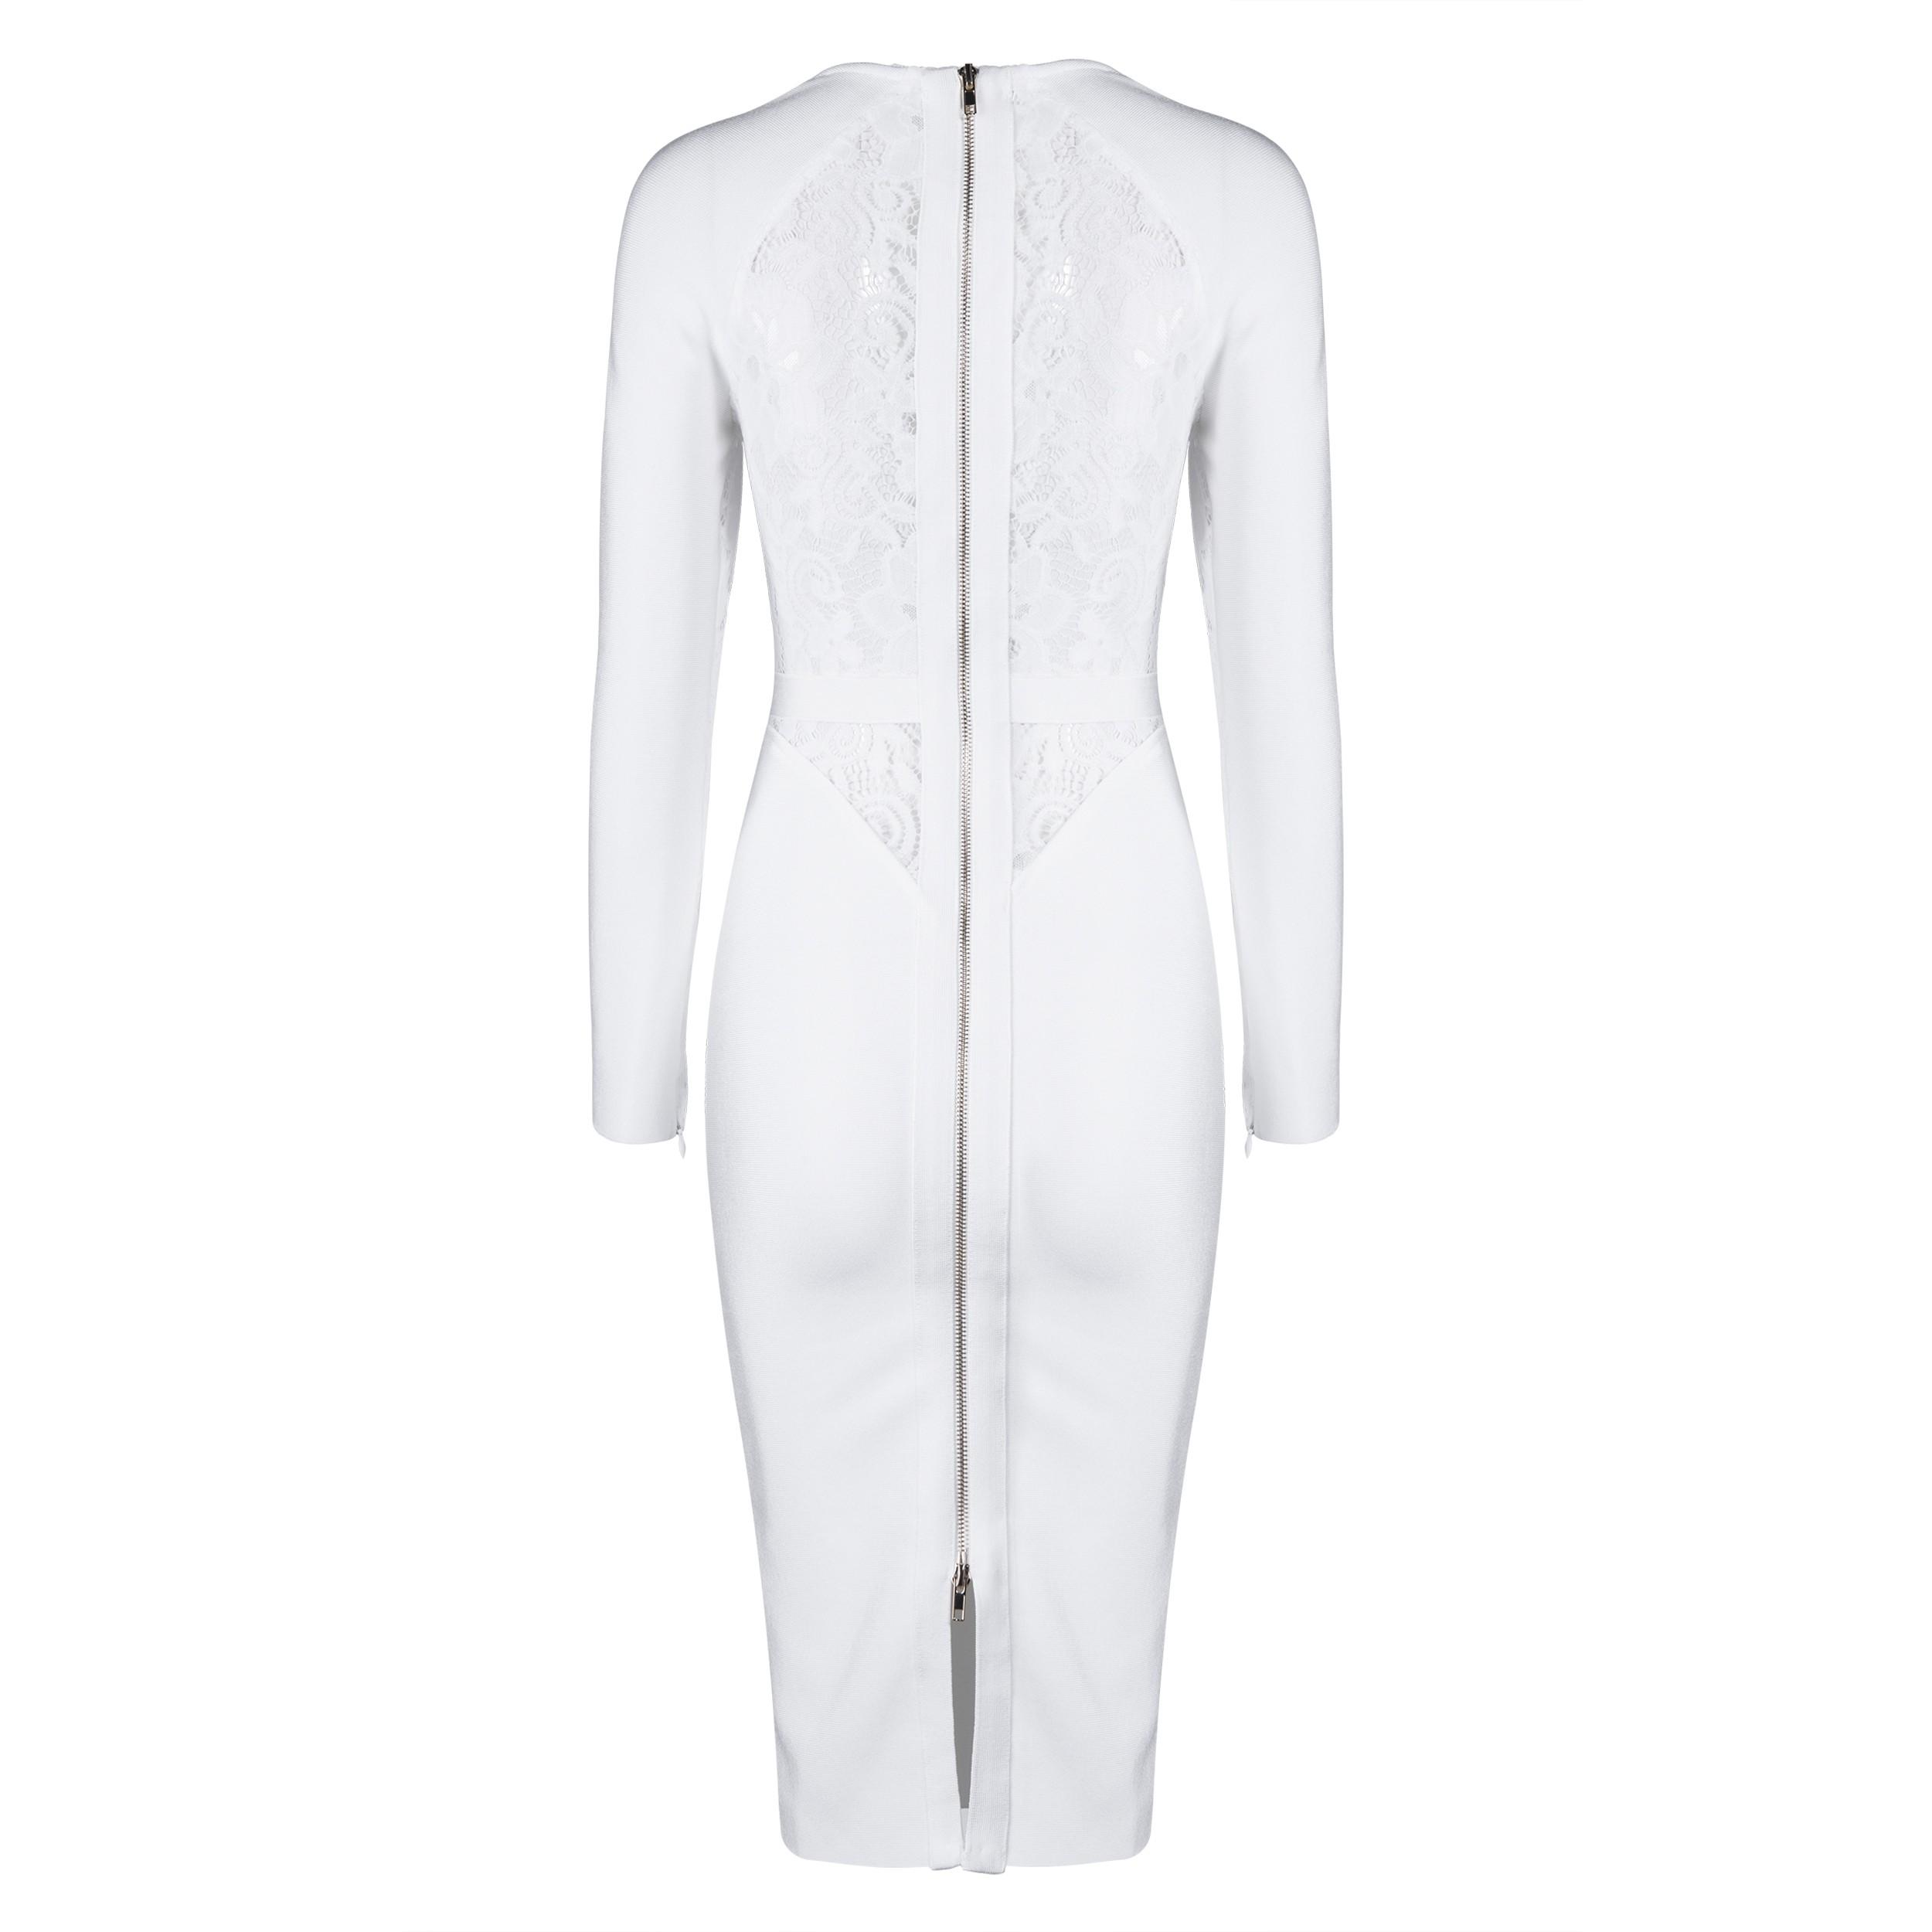 White Round Neck 3/4 Sleeve Over Knee Lace Up High Quality Bandage Dress HB4438-White